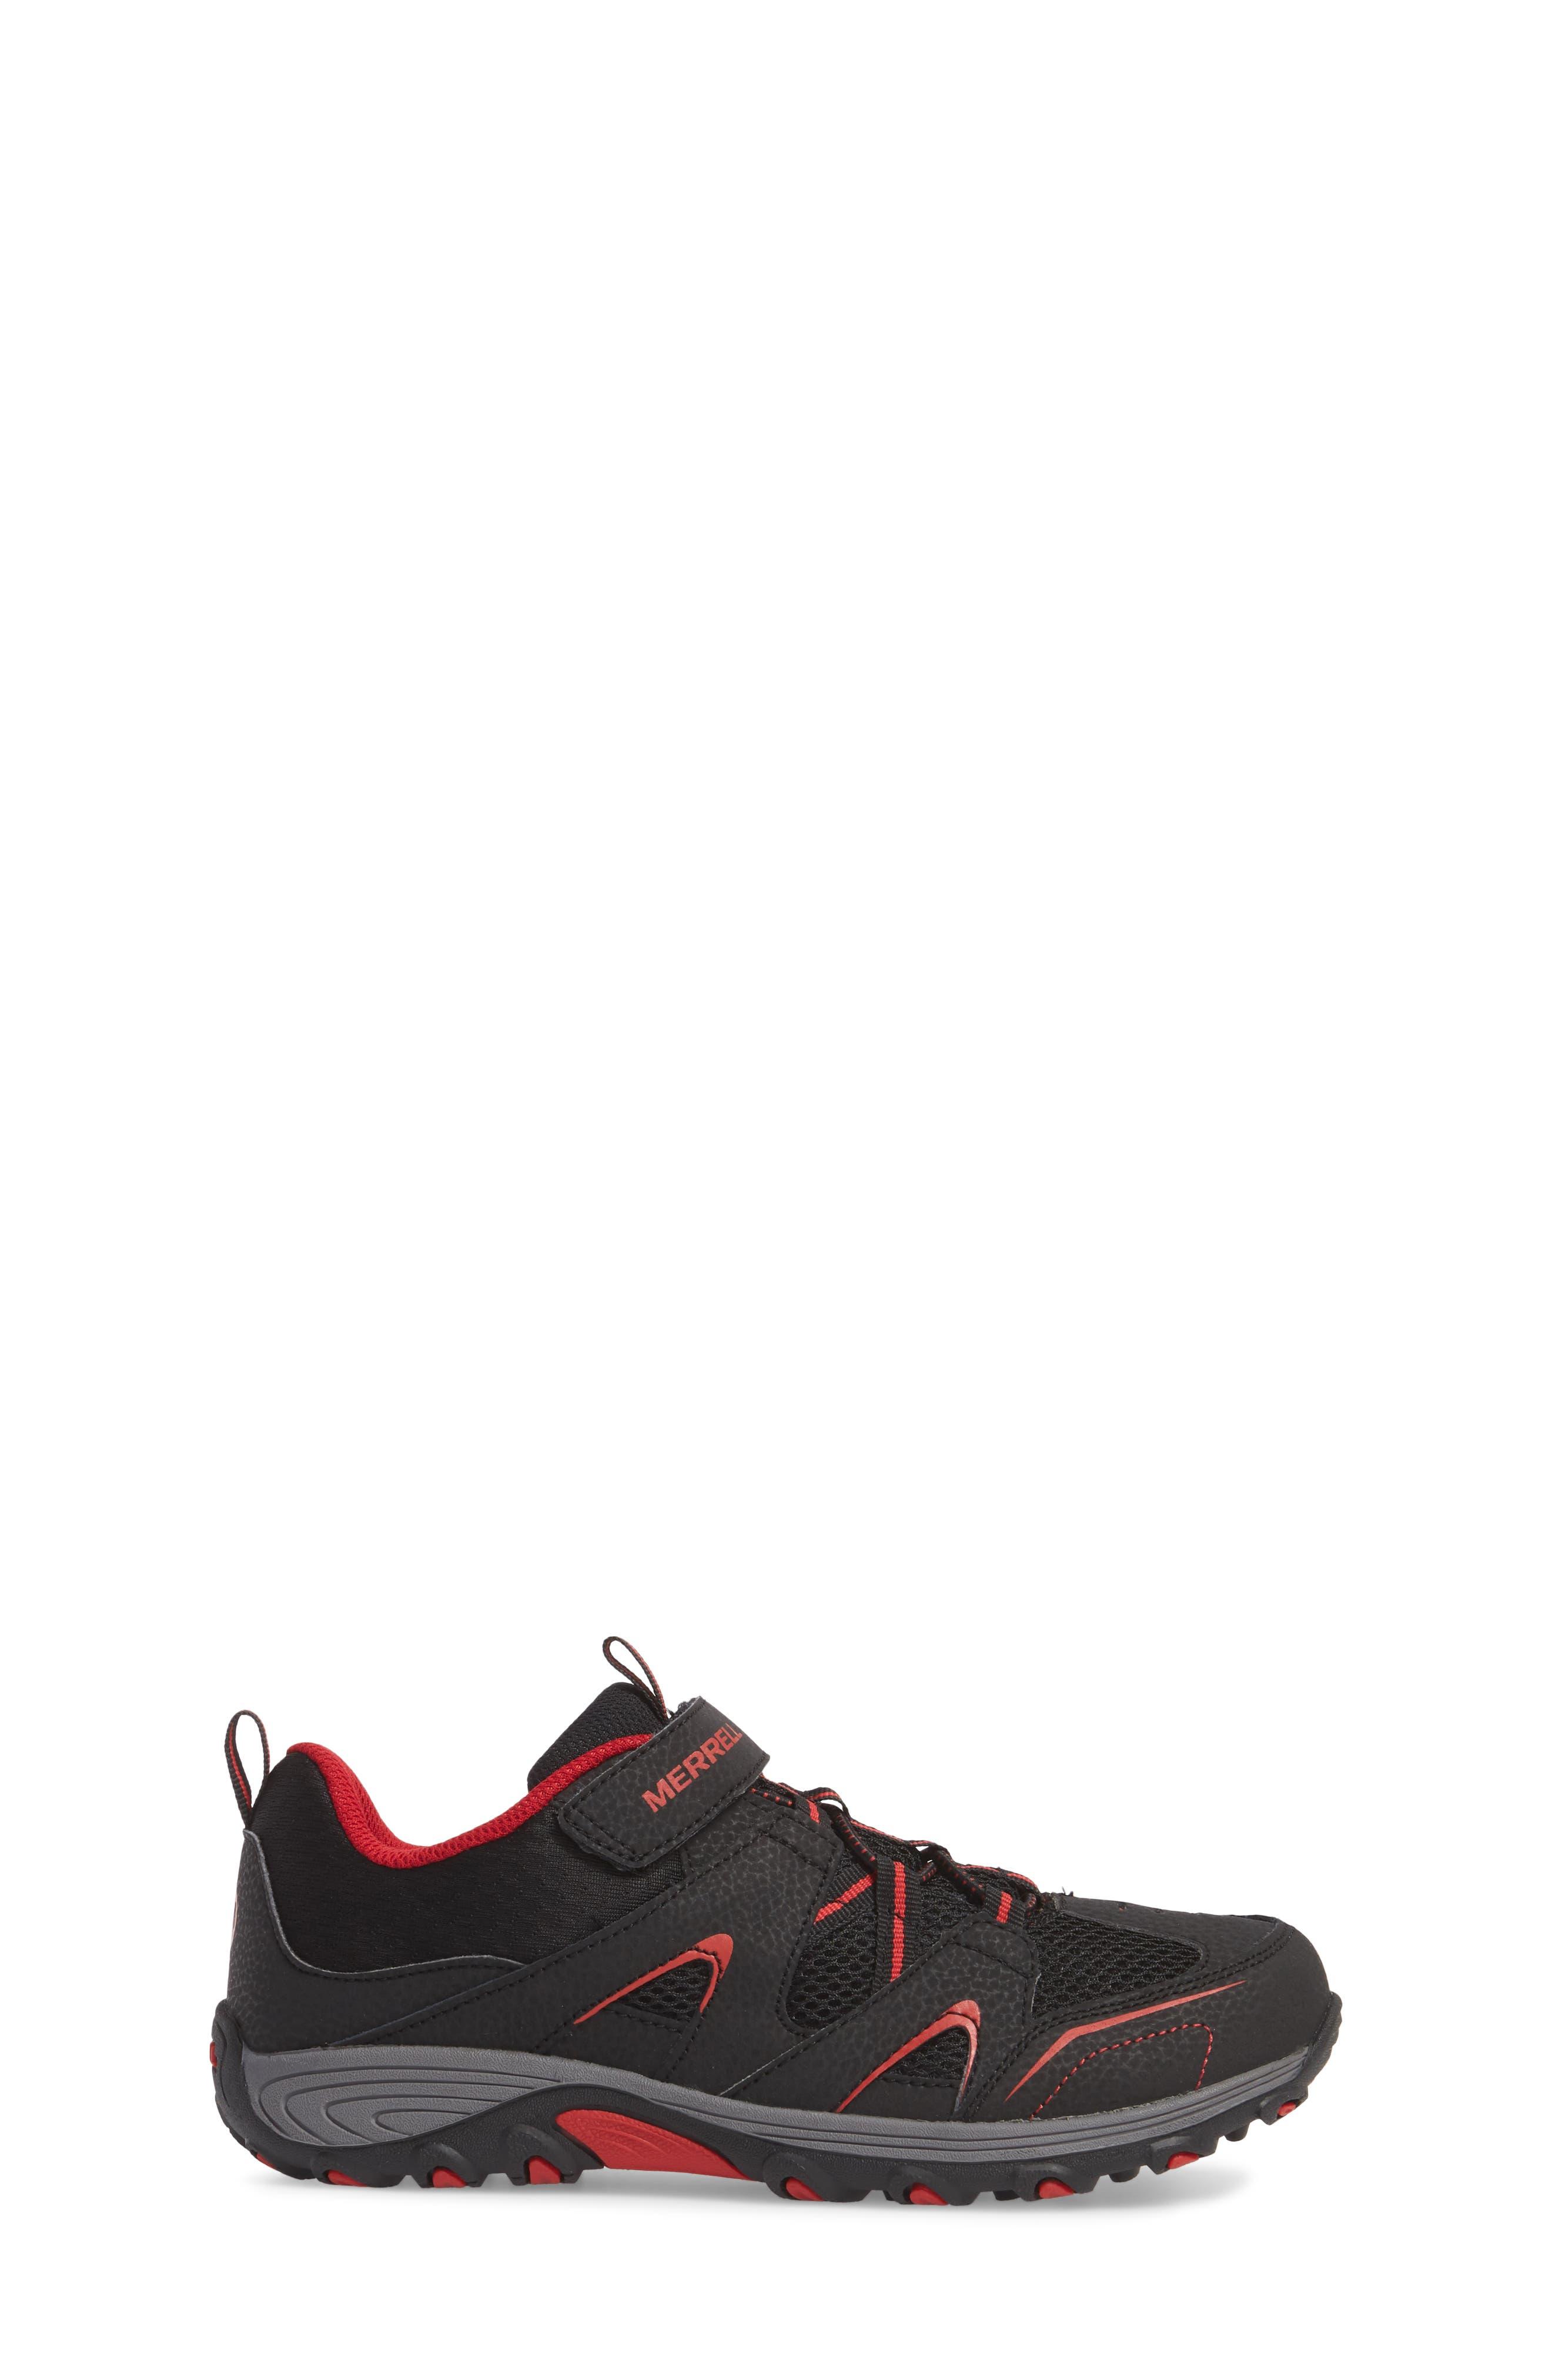 Trail Chaser Sneaker,                             Alternate thumbnail 3, color,                             Black/ Red